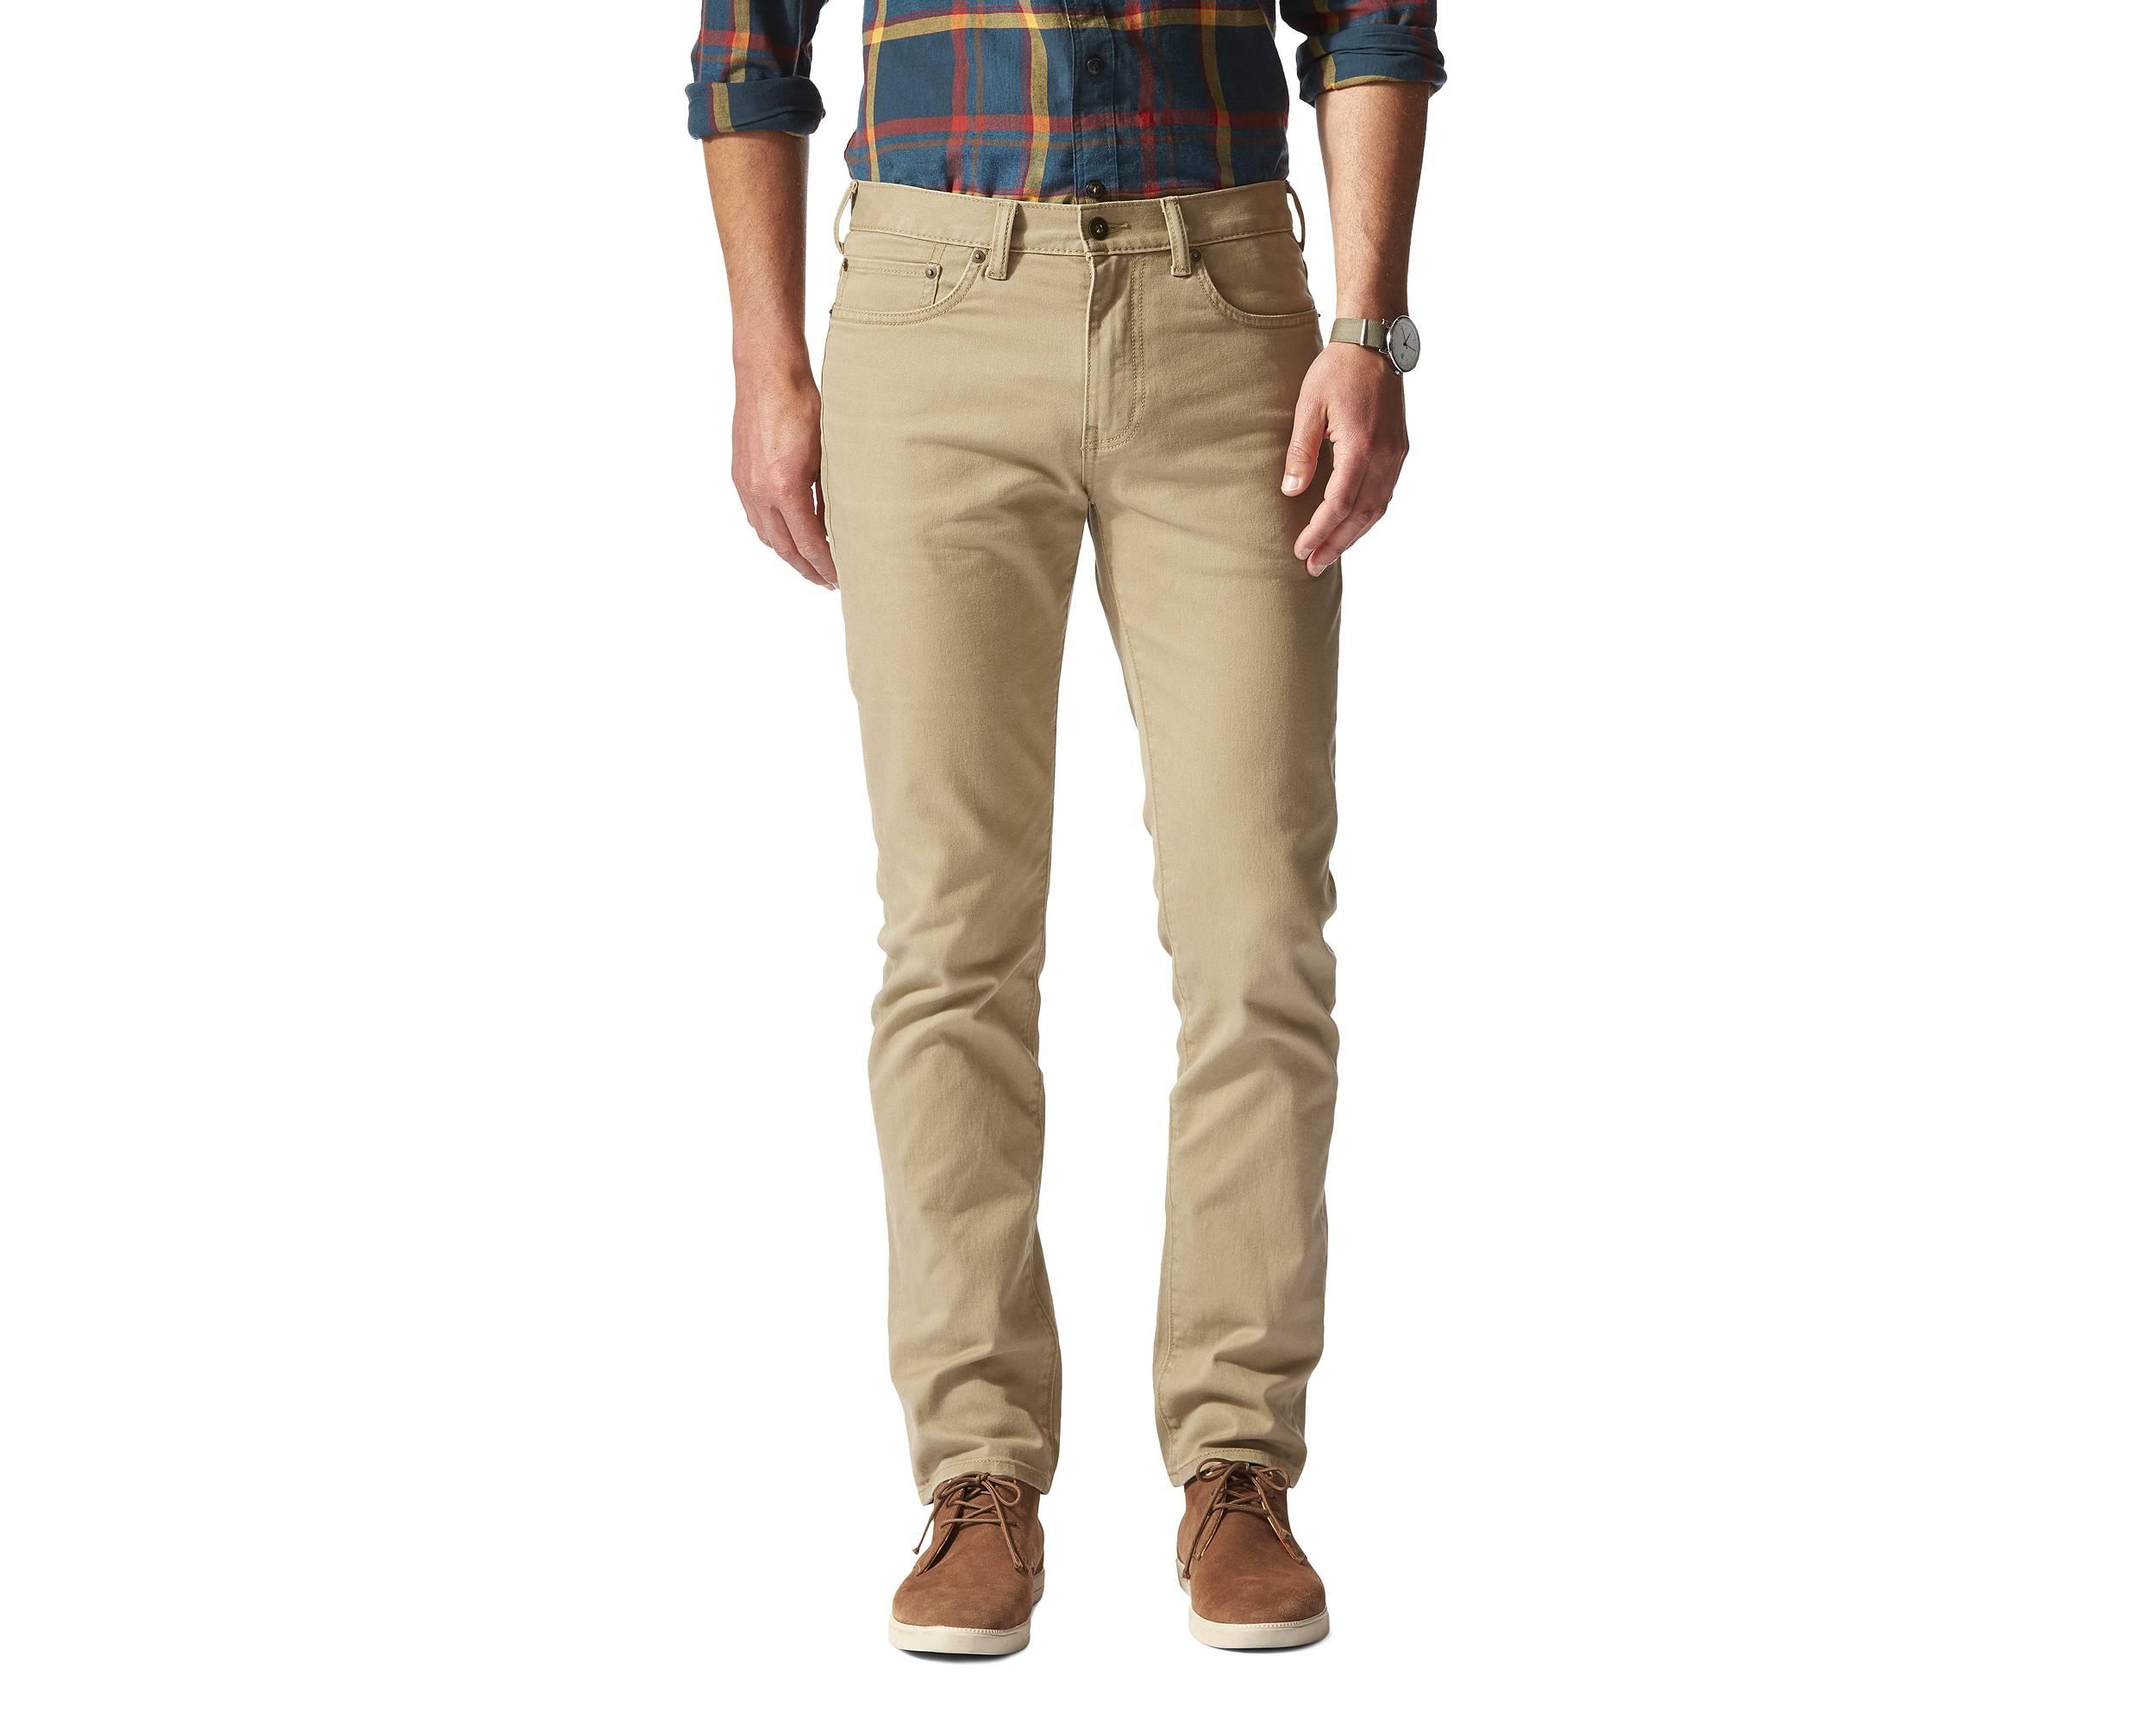 Khaki Jeans for Men - Shop Men's Khaki Jeans | Dockers®